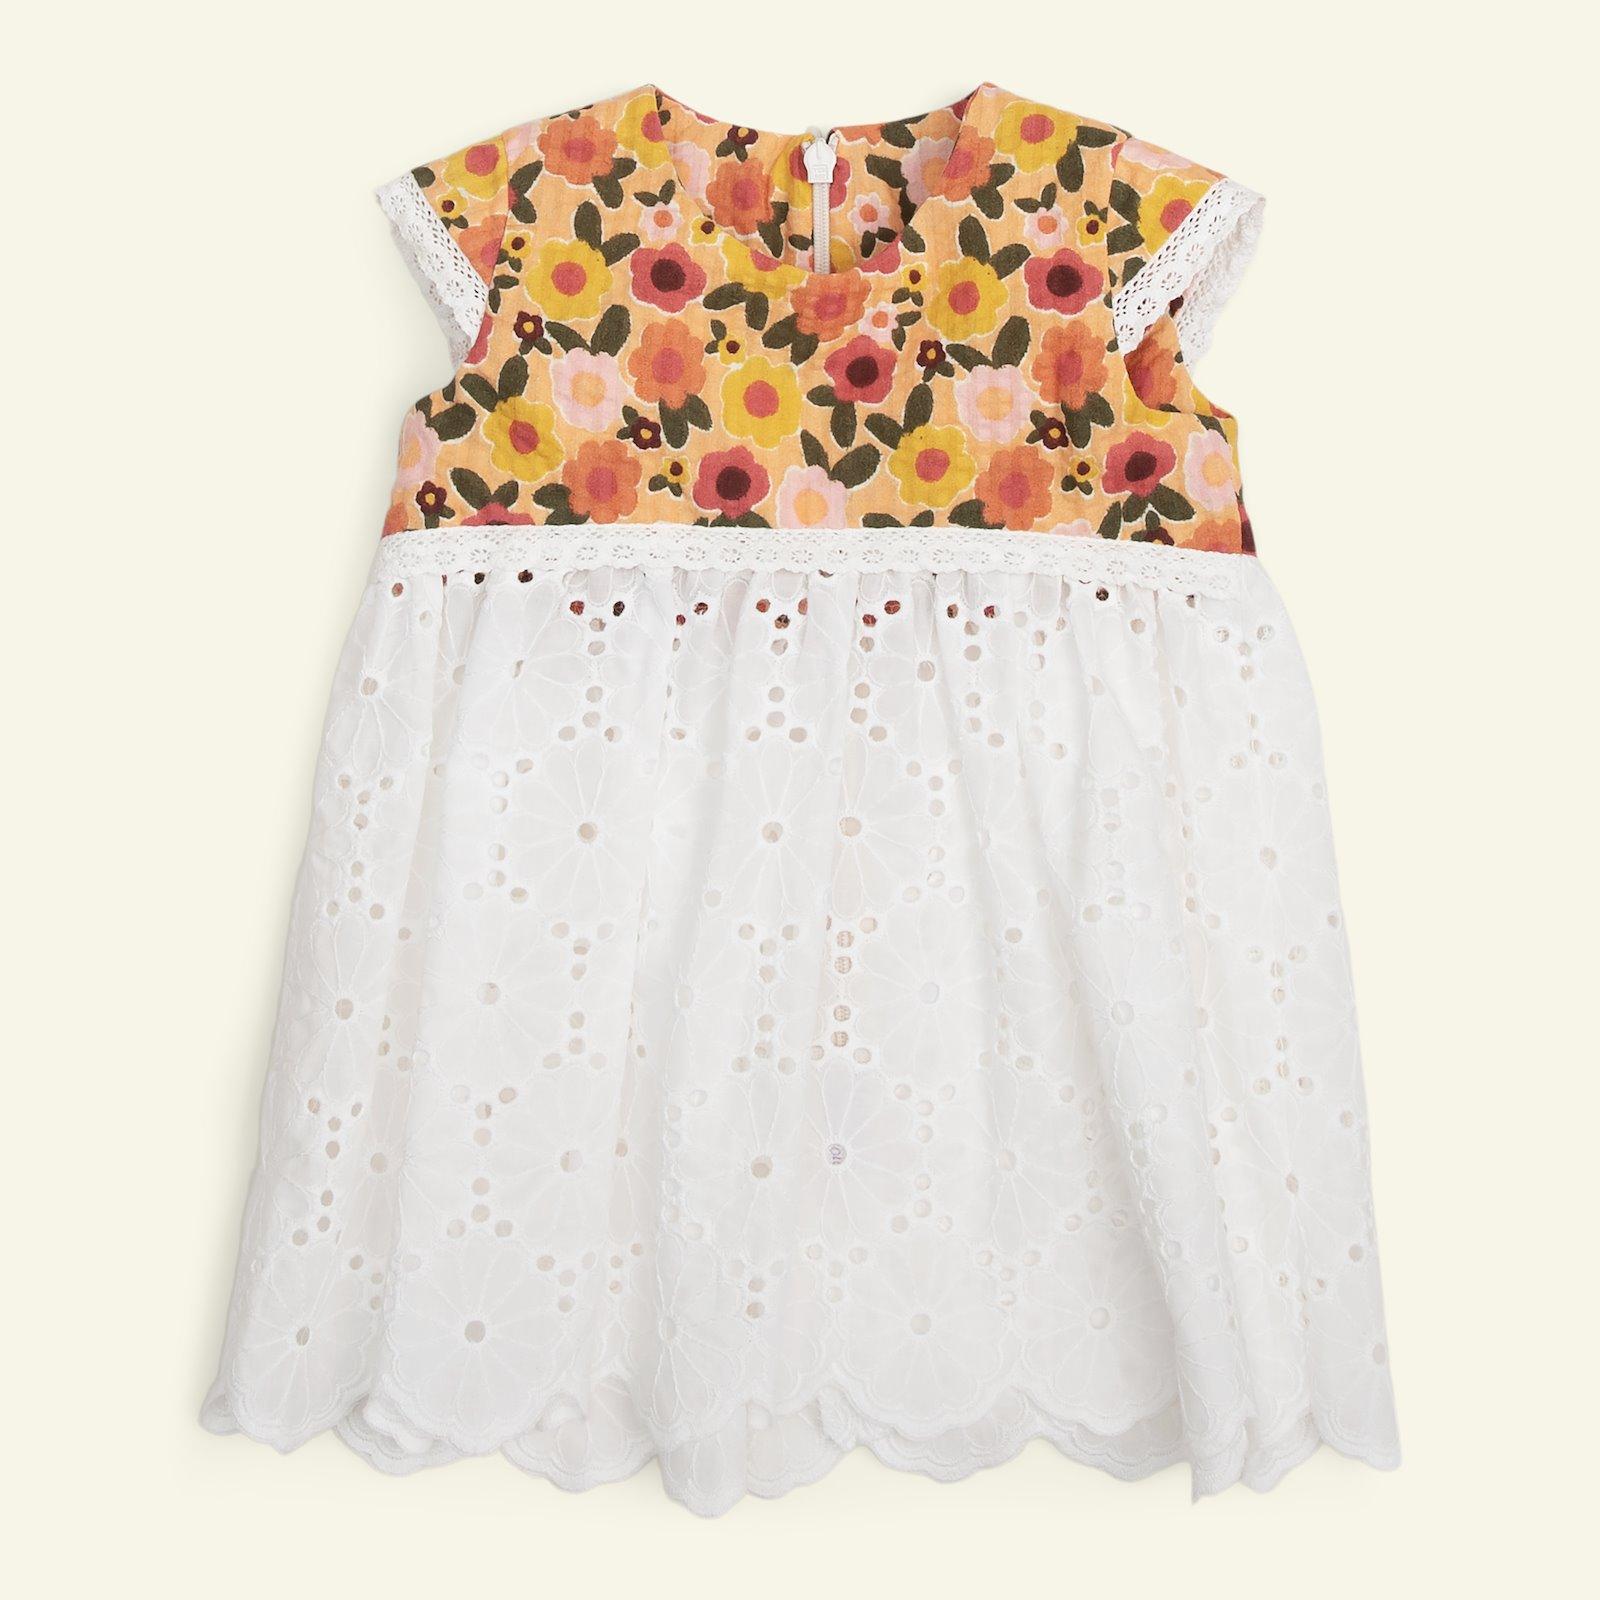 Dress, 68/6m p83014_580056_550105_25145_sskit